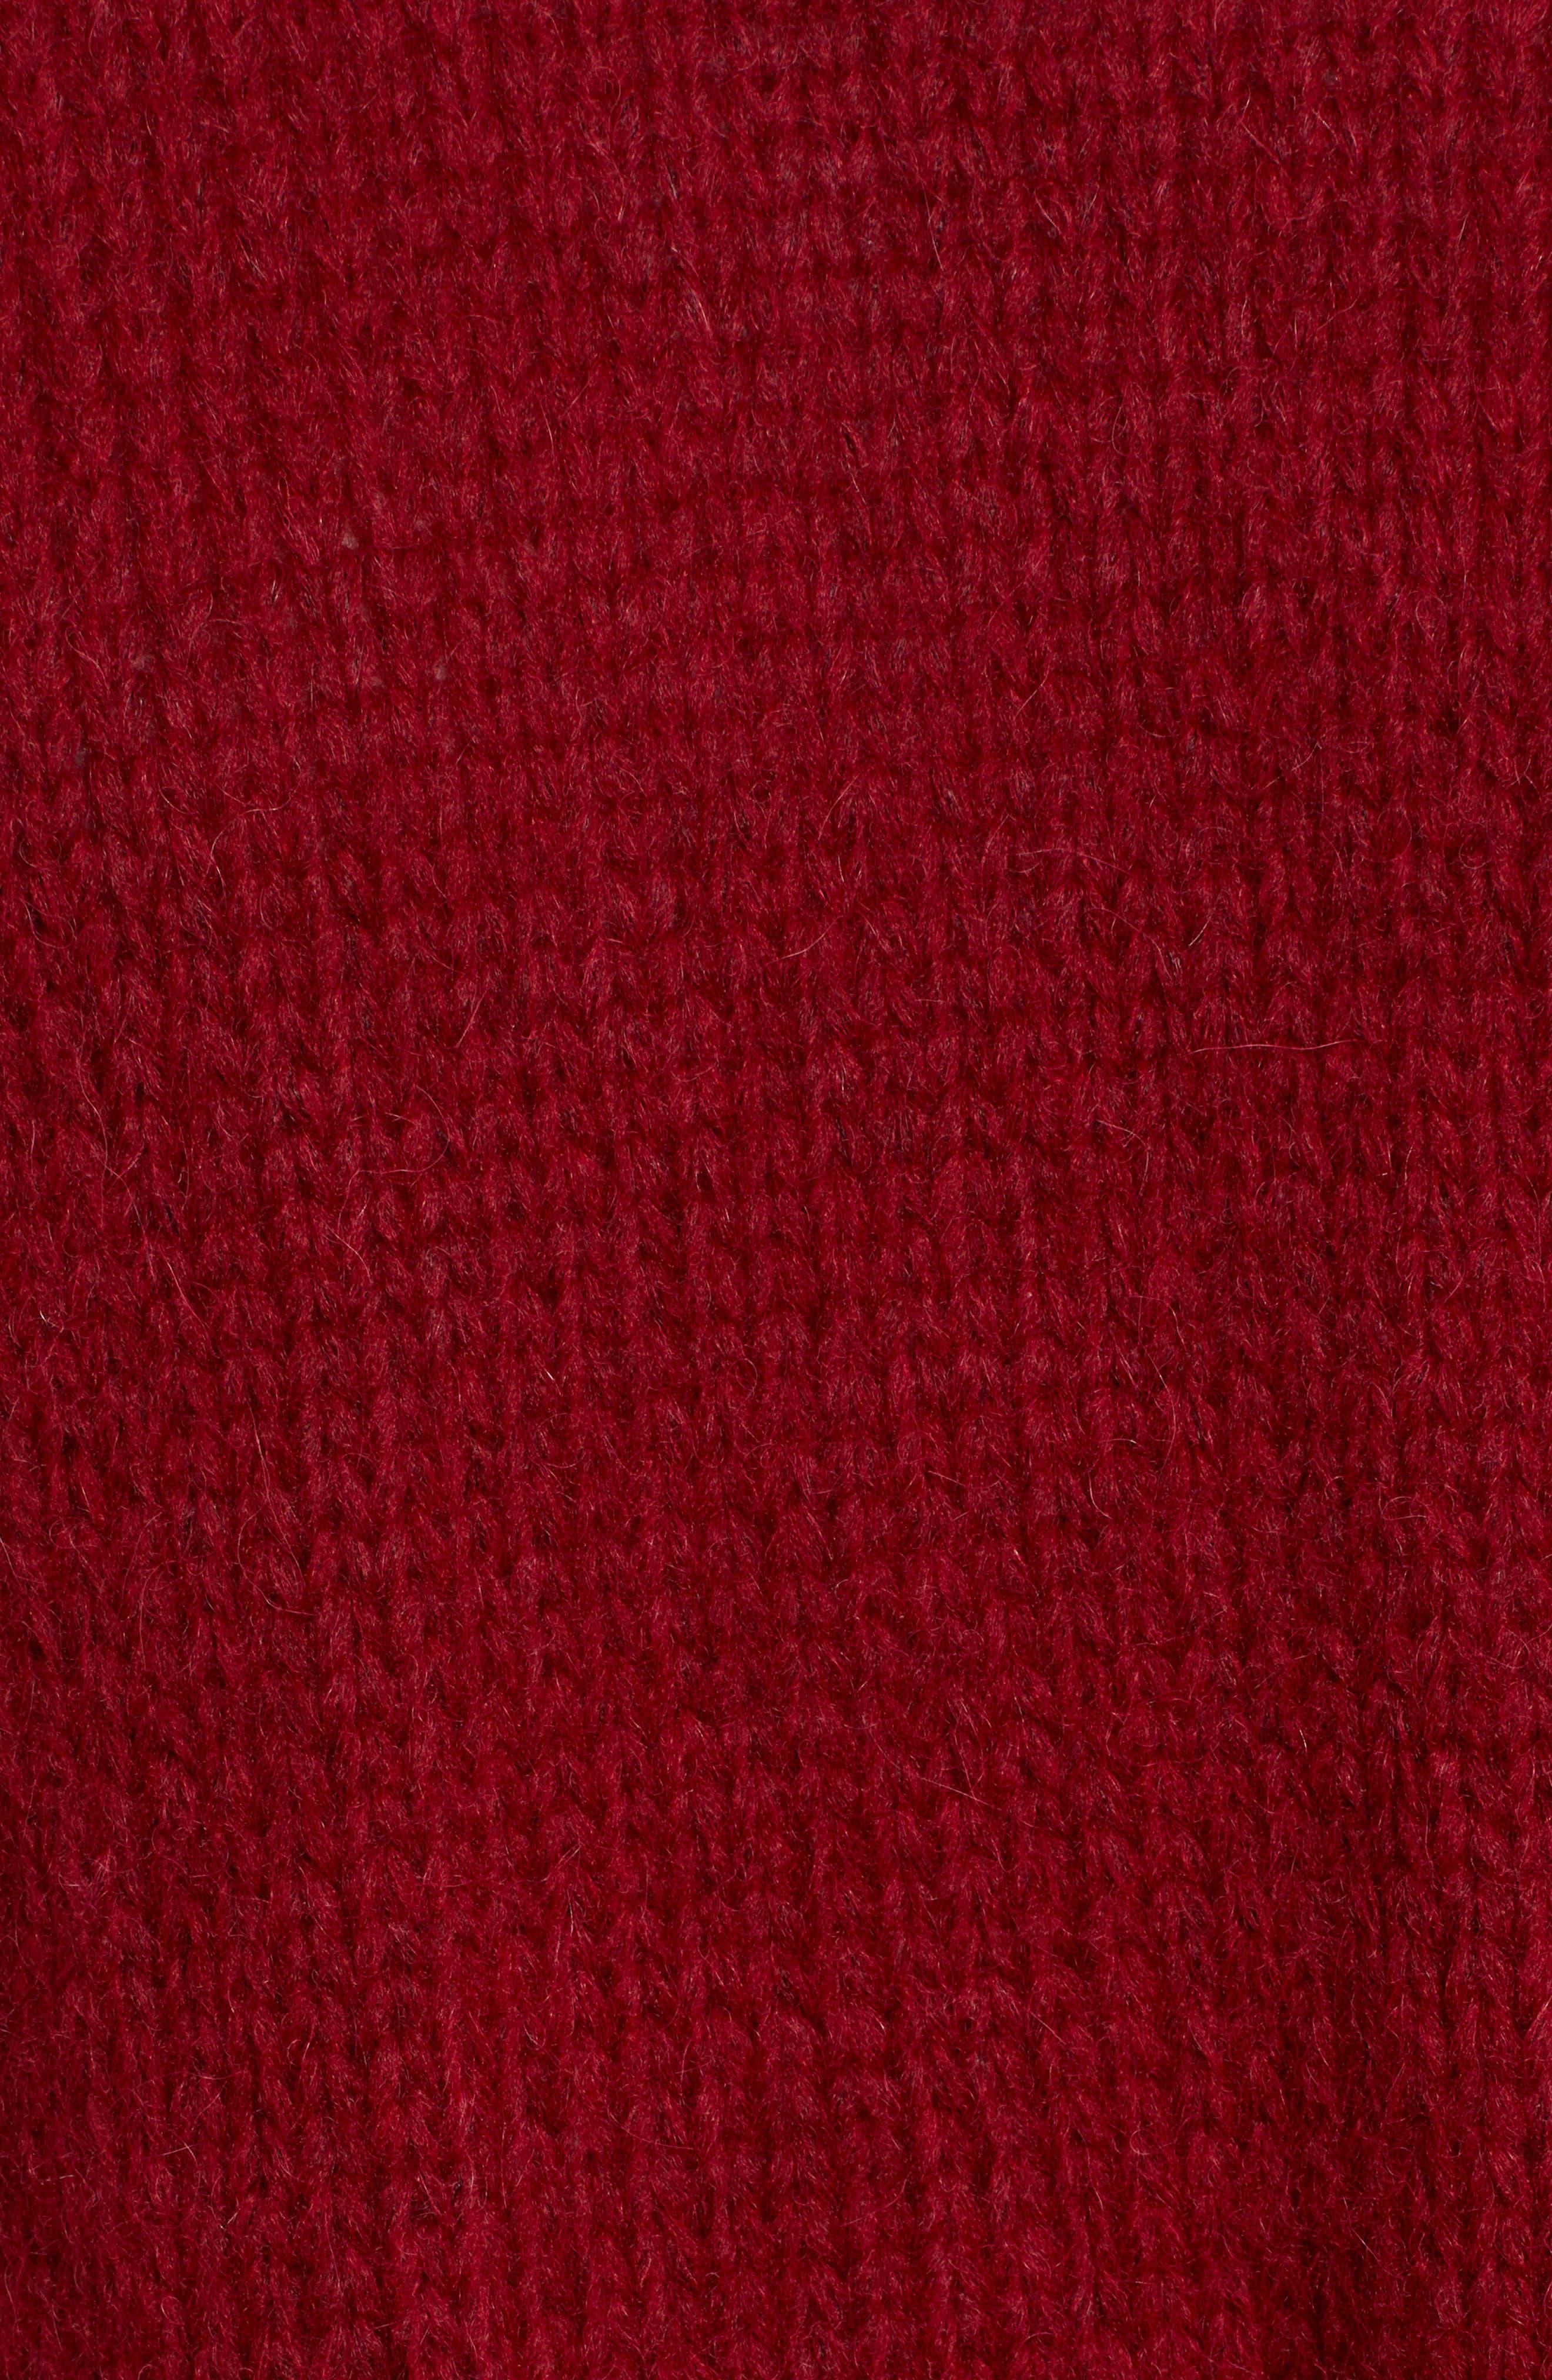 Wool Alpaca Blend Crewneck Sweater,                             Alternate thumbnail 5, color,                             WINE